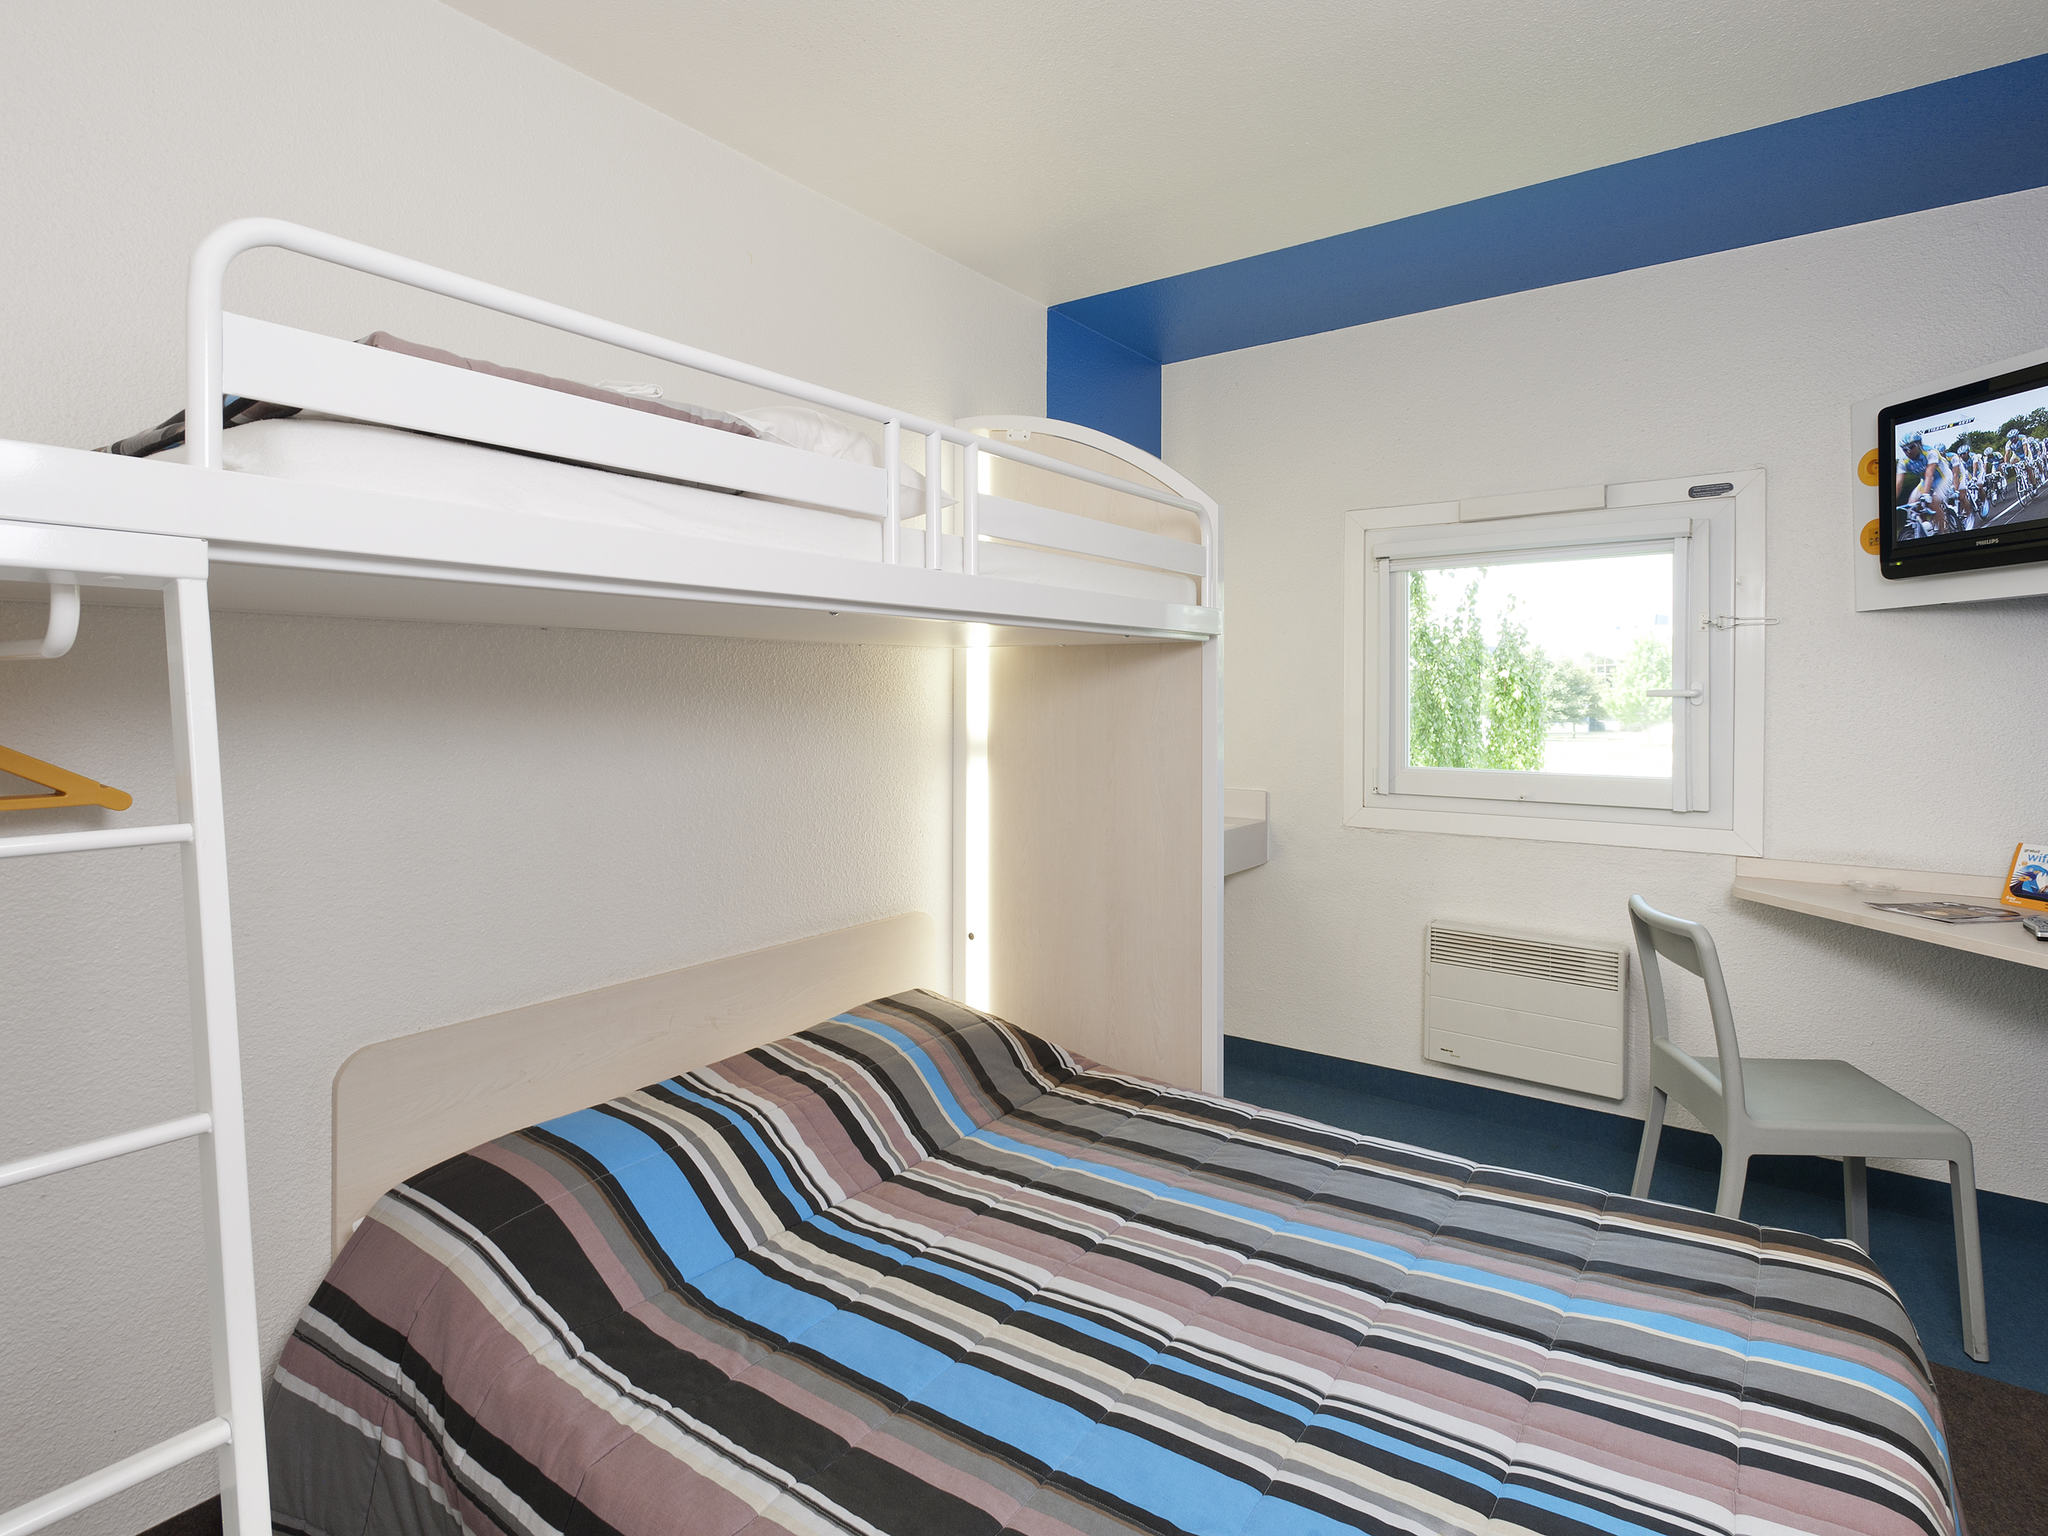 h tel saint nabord hotelf1 remiremont saint nabord. Black Bedroom Furniture Sets. Home Design Ideas